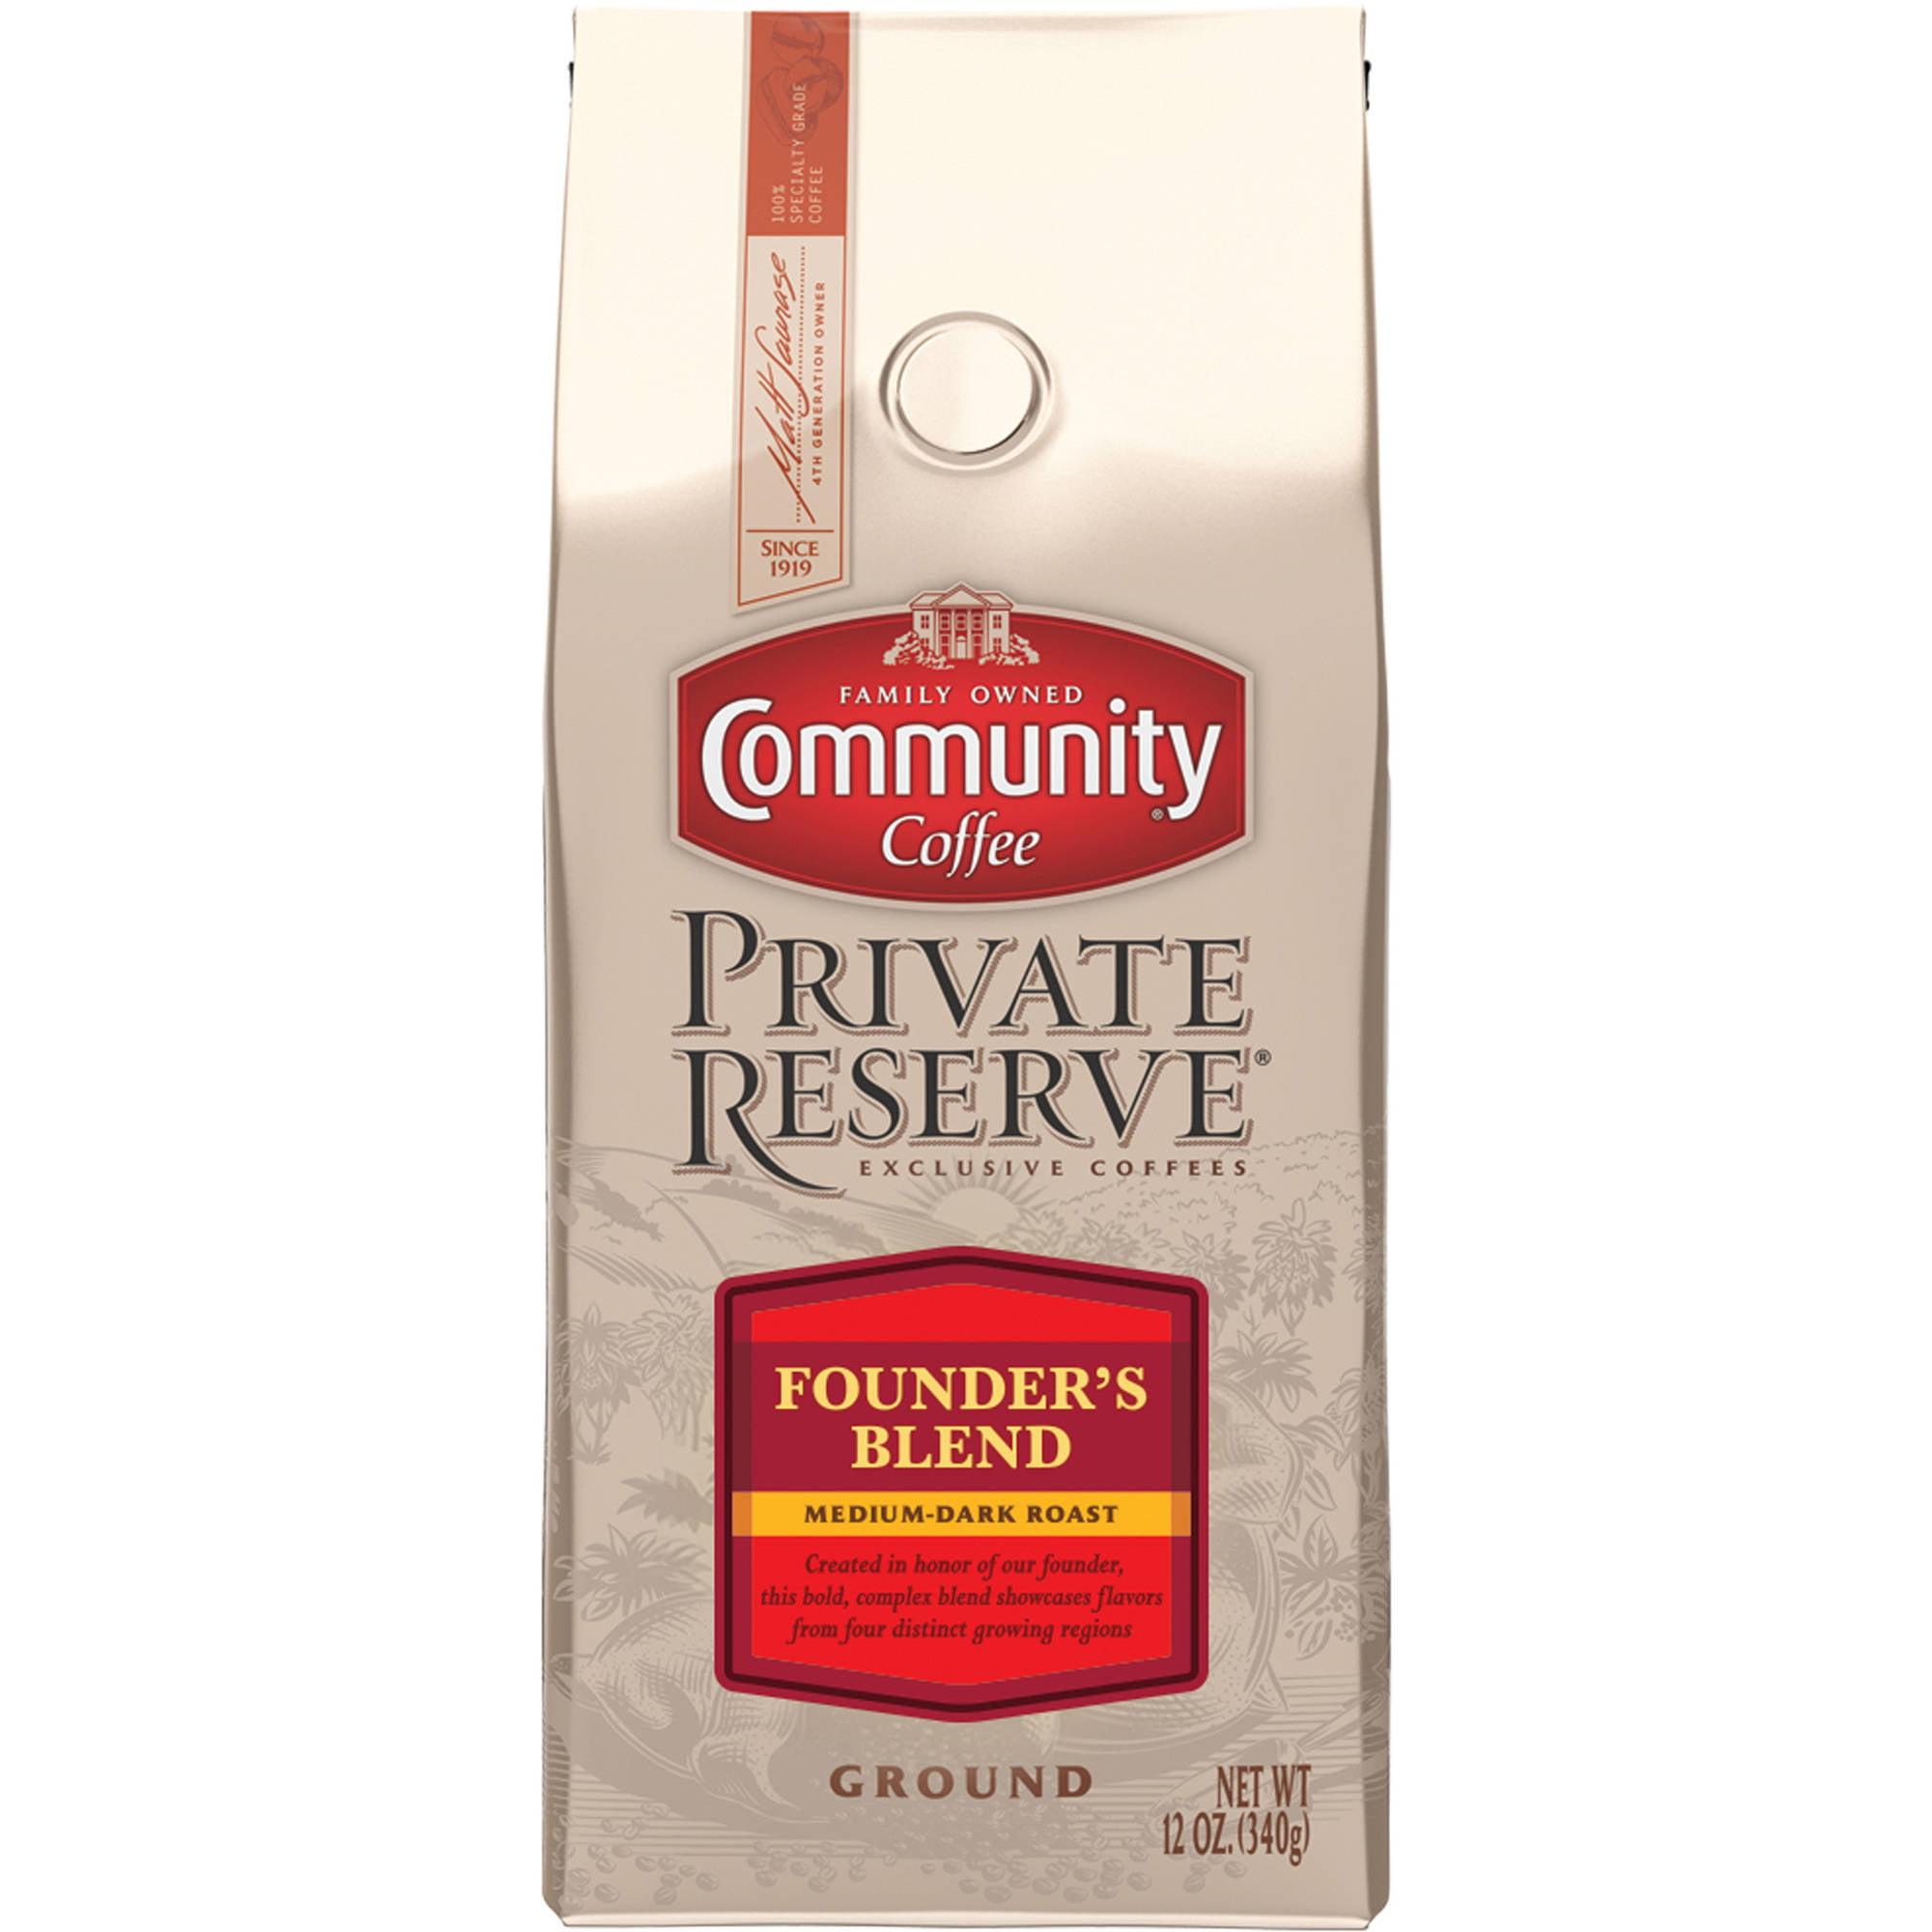 Community Coffee Private Reserve Founder's Blend Medium-Dark Roast Ground Coffee, 12 oz